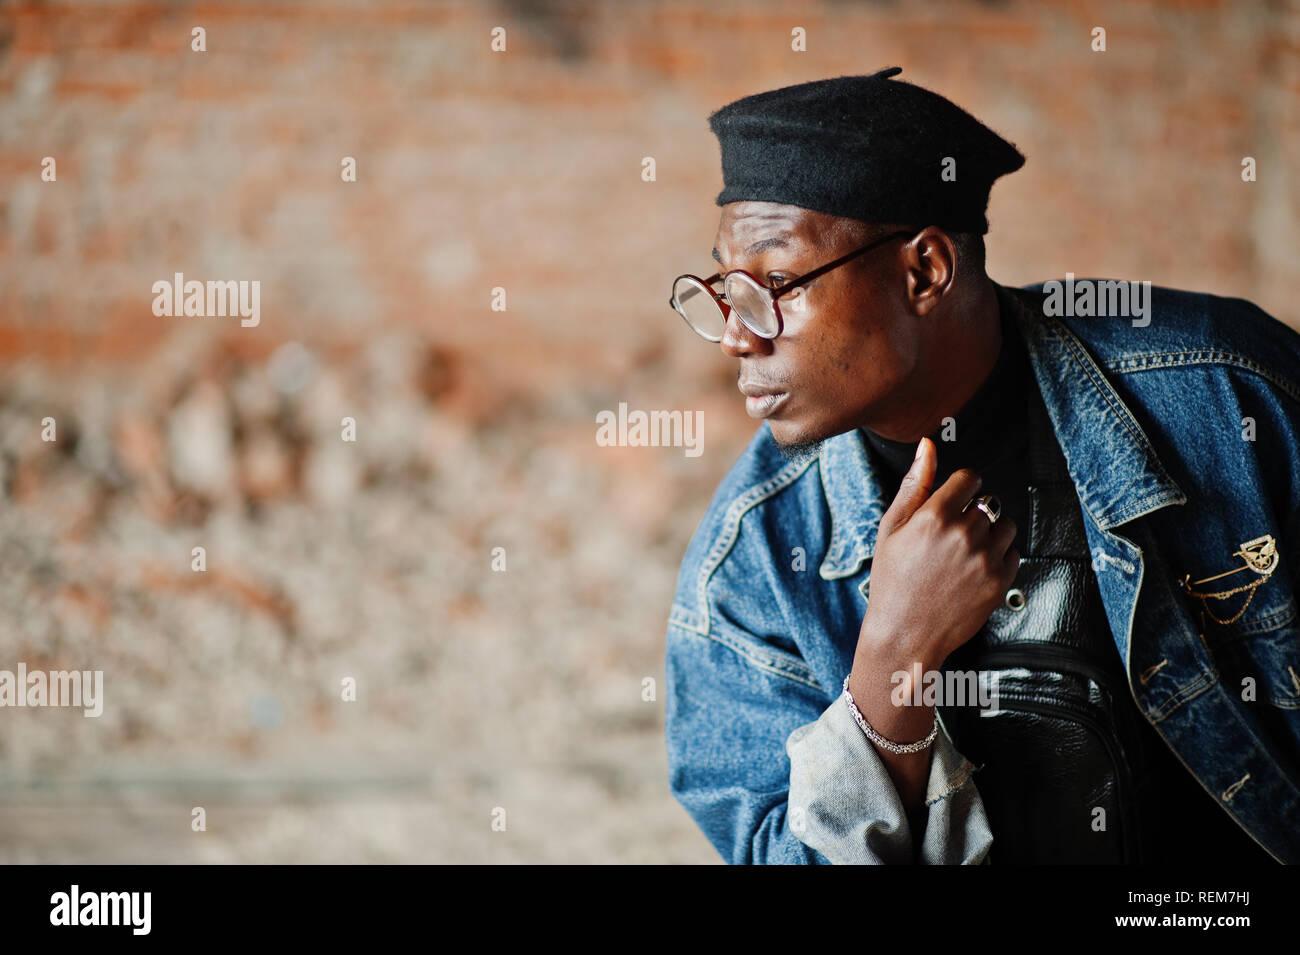 84454c9018e Young Thug Rap Stock Photos   Young Thug Rap Stock Images - Alamy